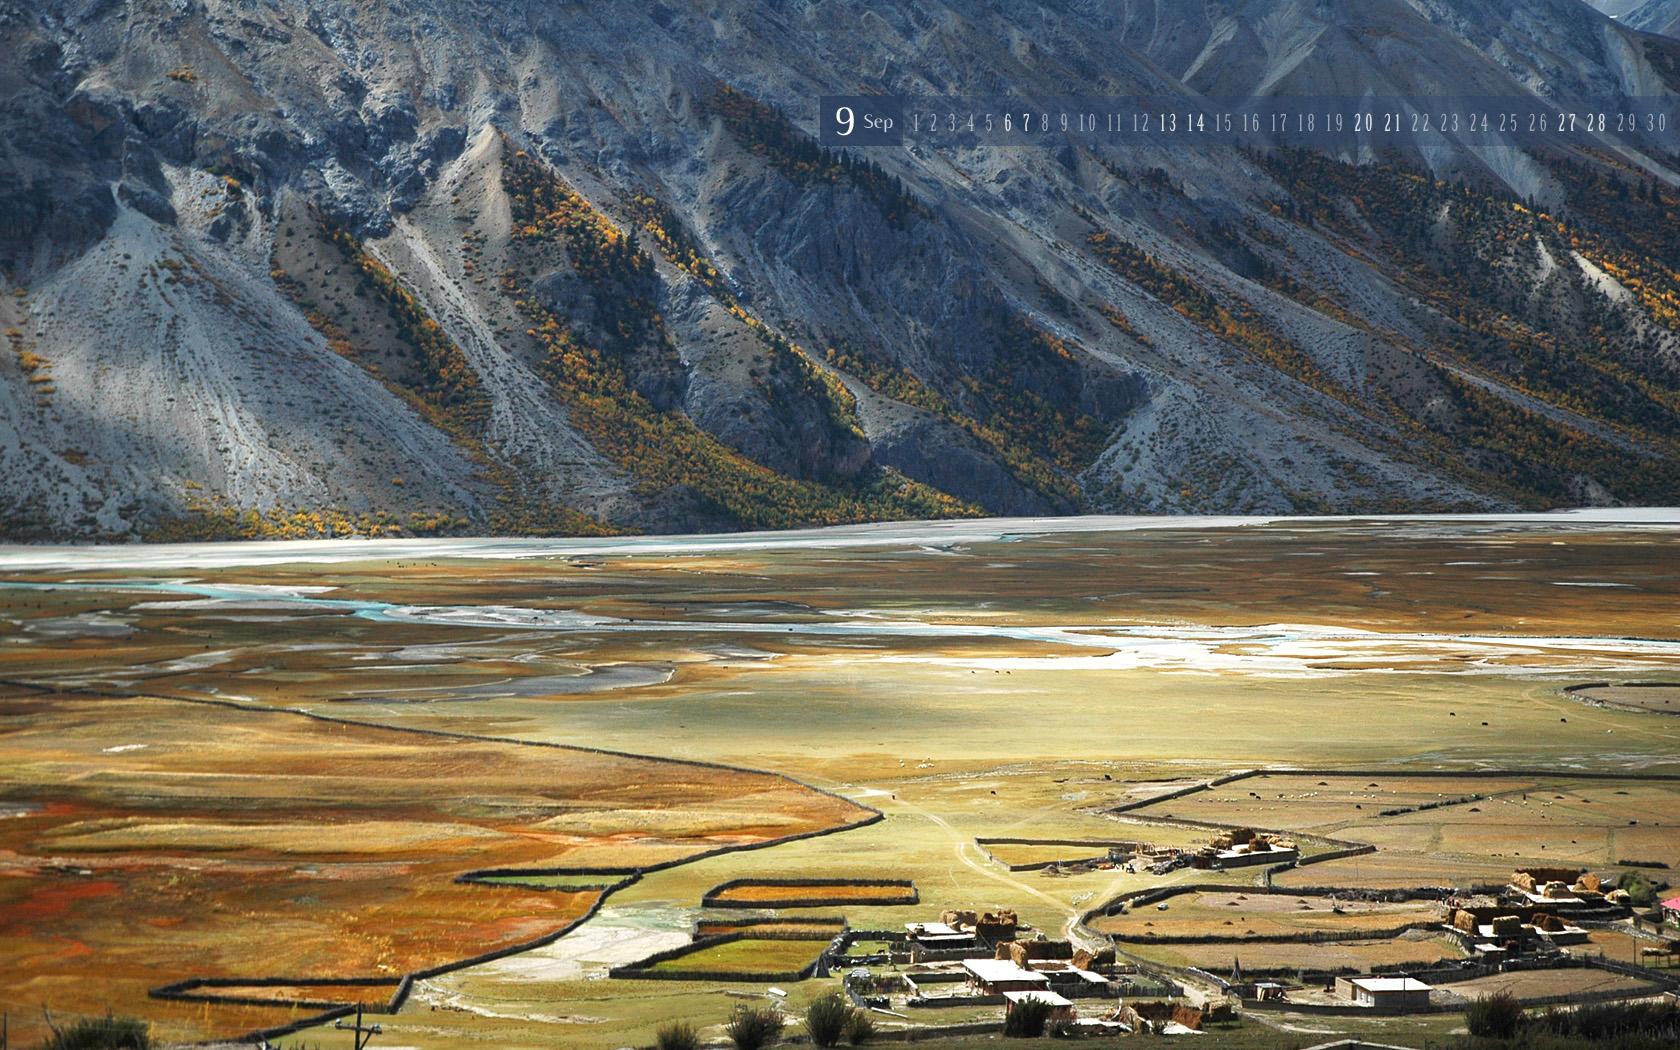 How To Help >> Sep | 西藏 然乌河边的小村 Riverside village, Rawu, Tibet 1680x1050 | Flickr